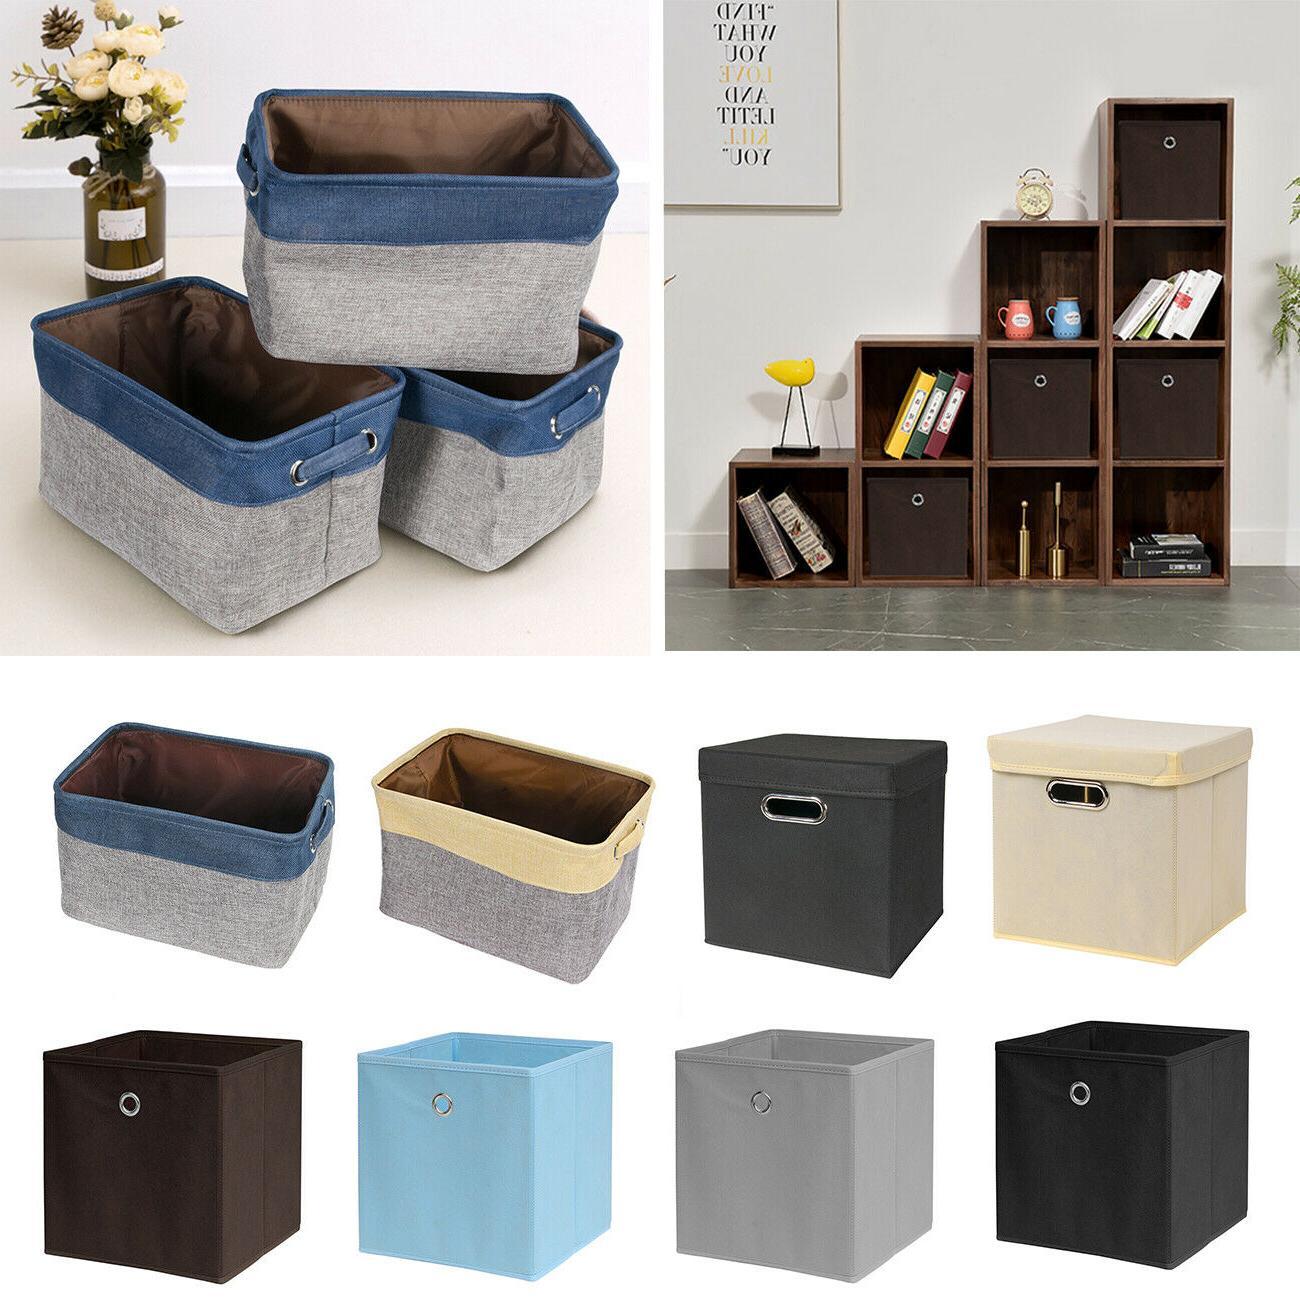 2 10pcs foldable fabric storage cube box